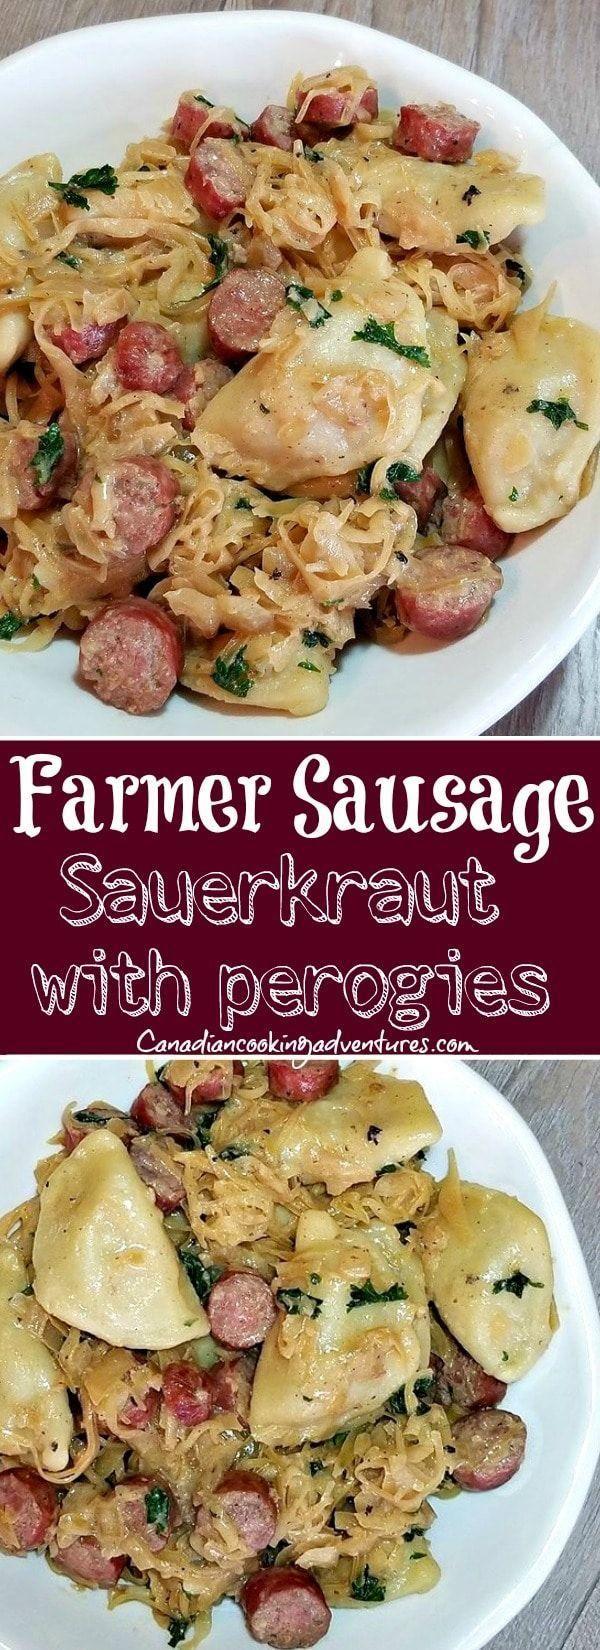 Farmer Sausage Skillet with Perogies  - Food -